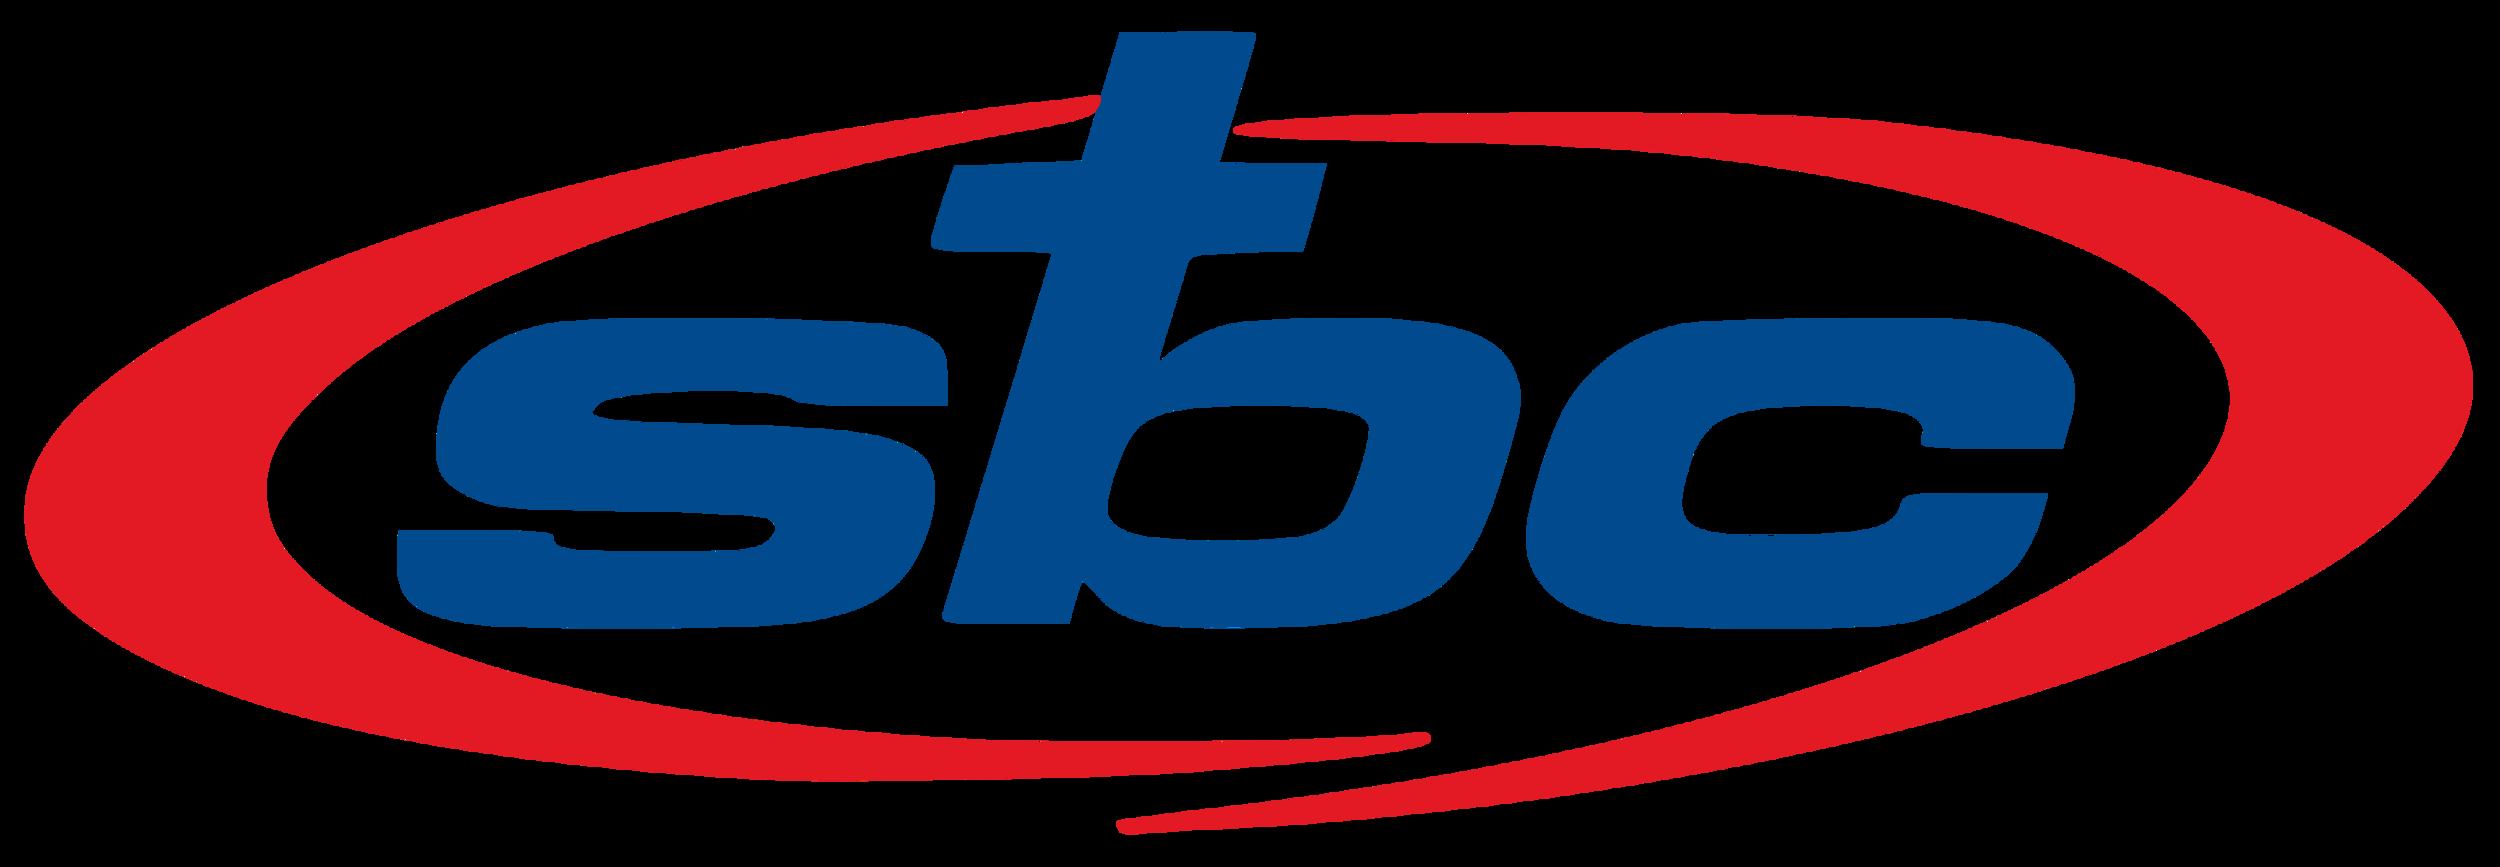 SBC logo large transparent color.PNG